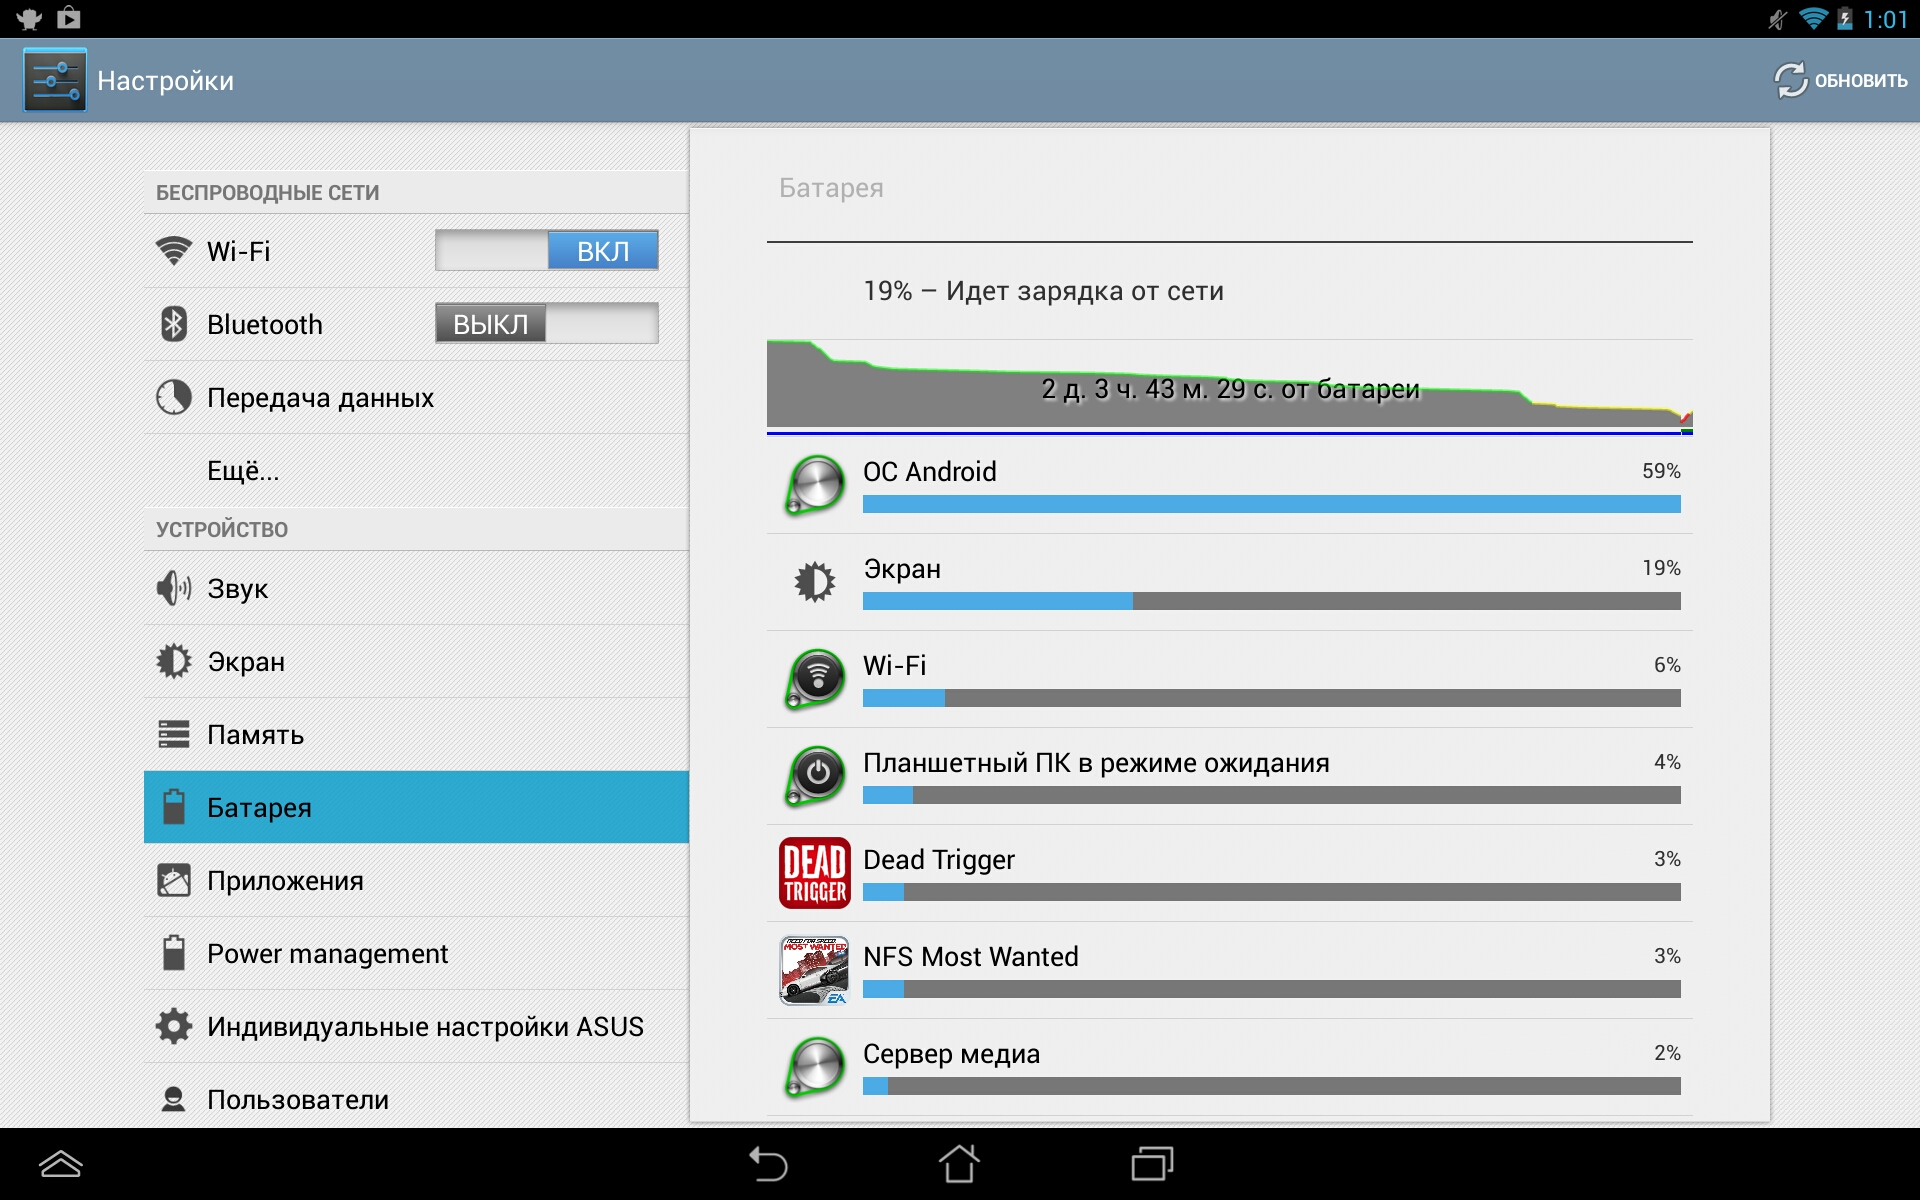 Screenshot_2013-07-12-01-01-29